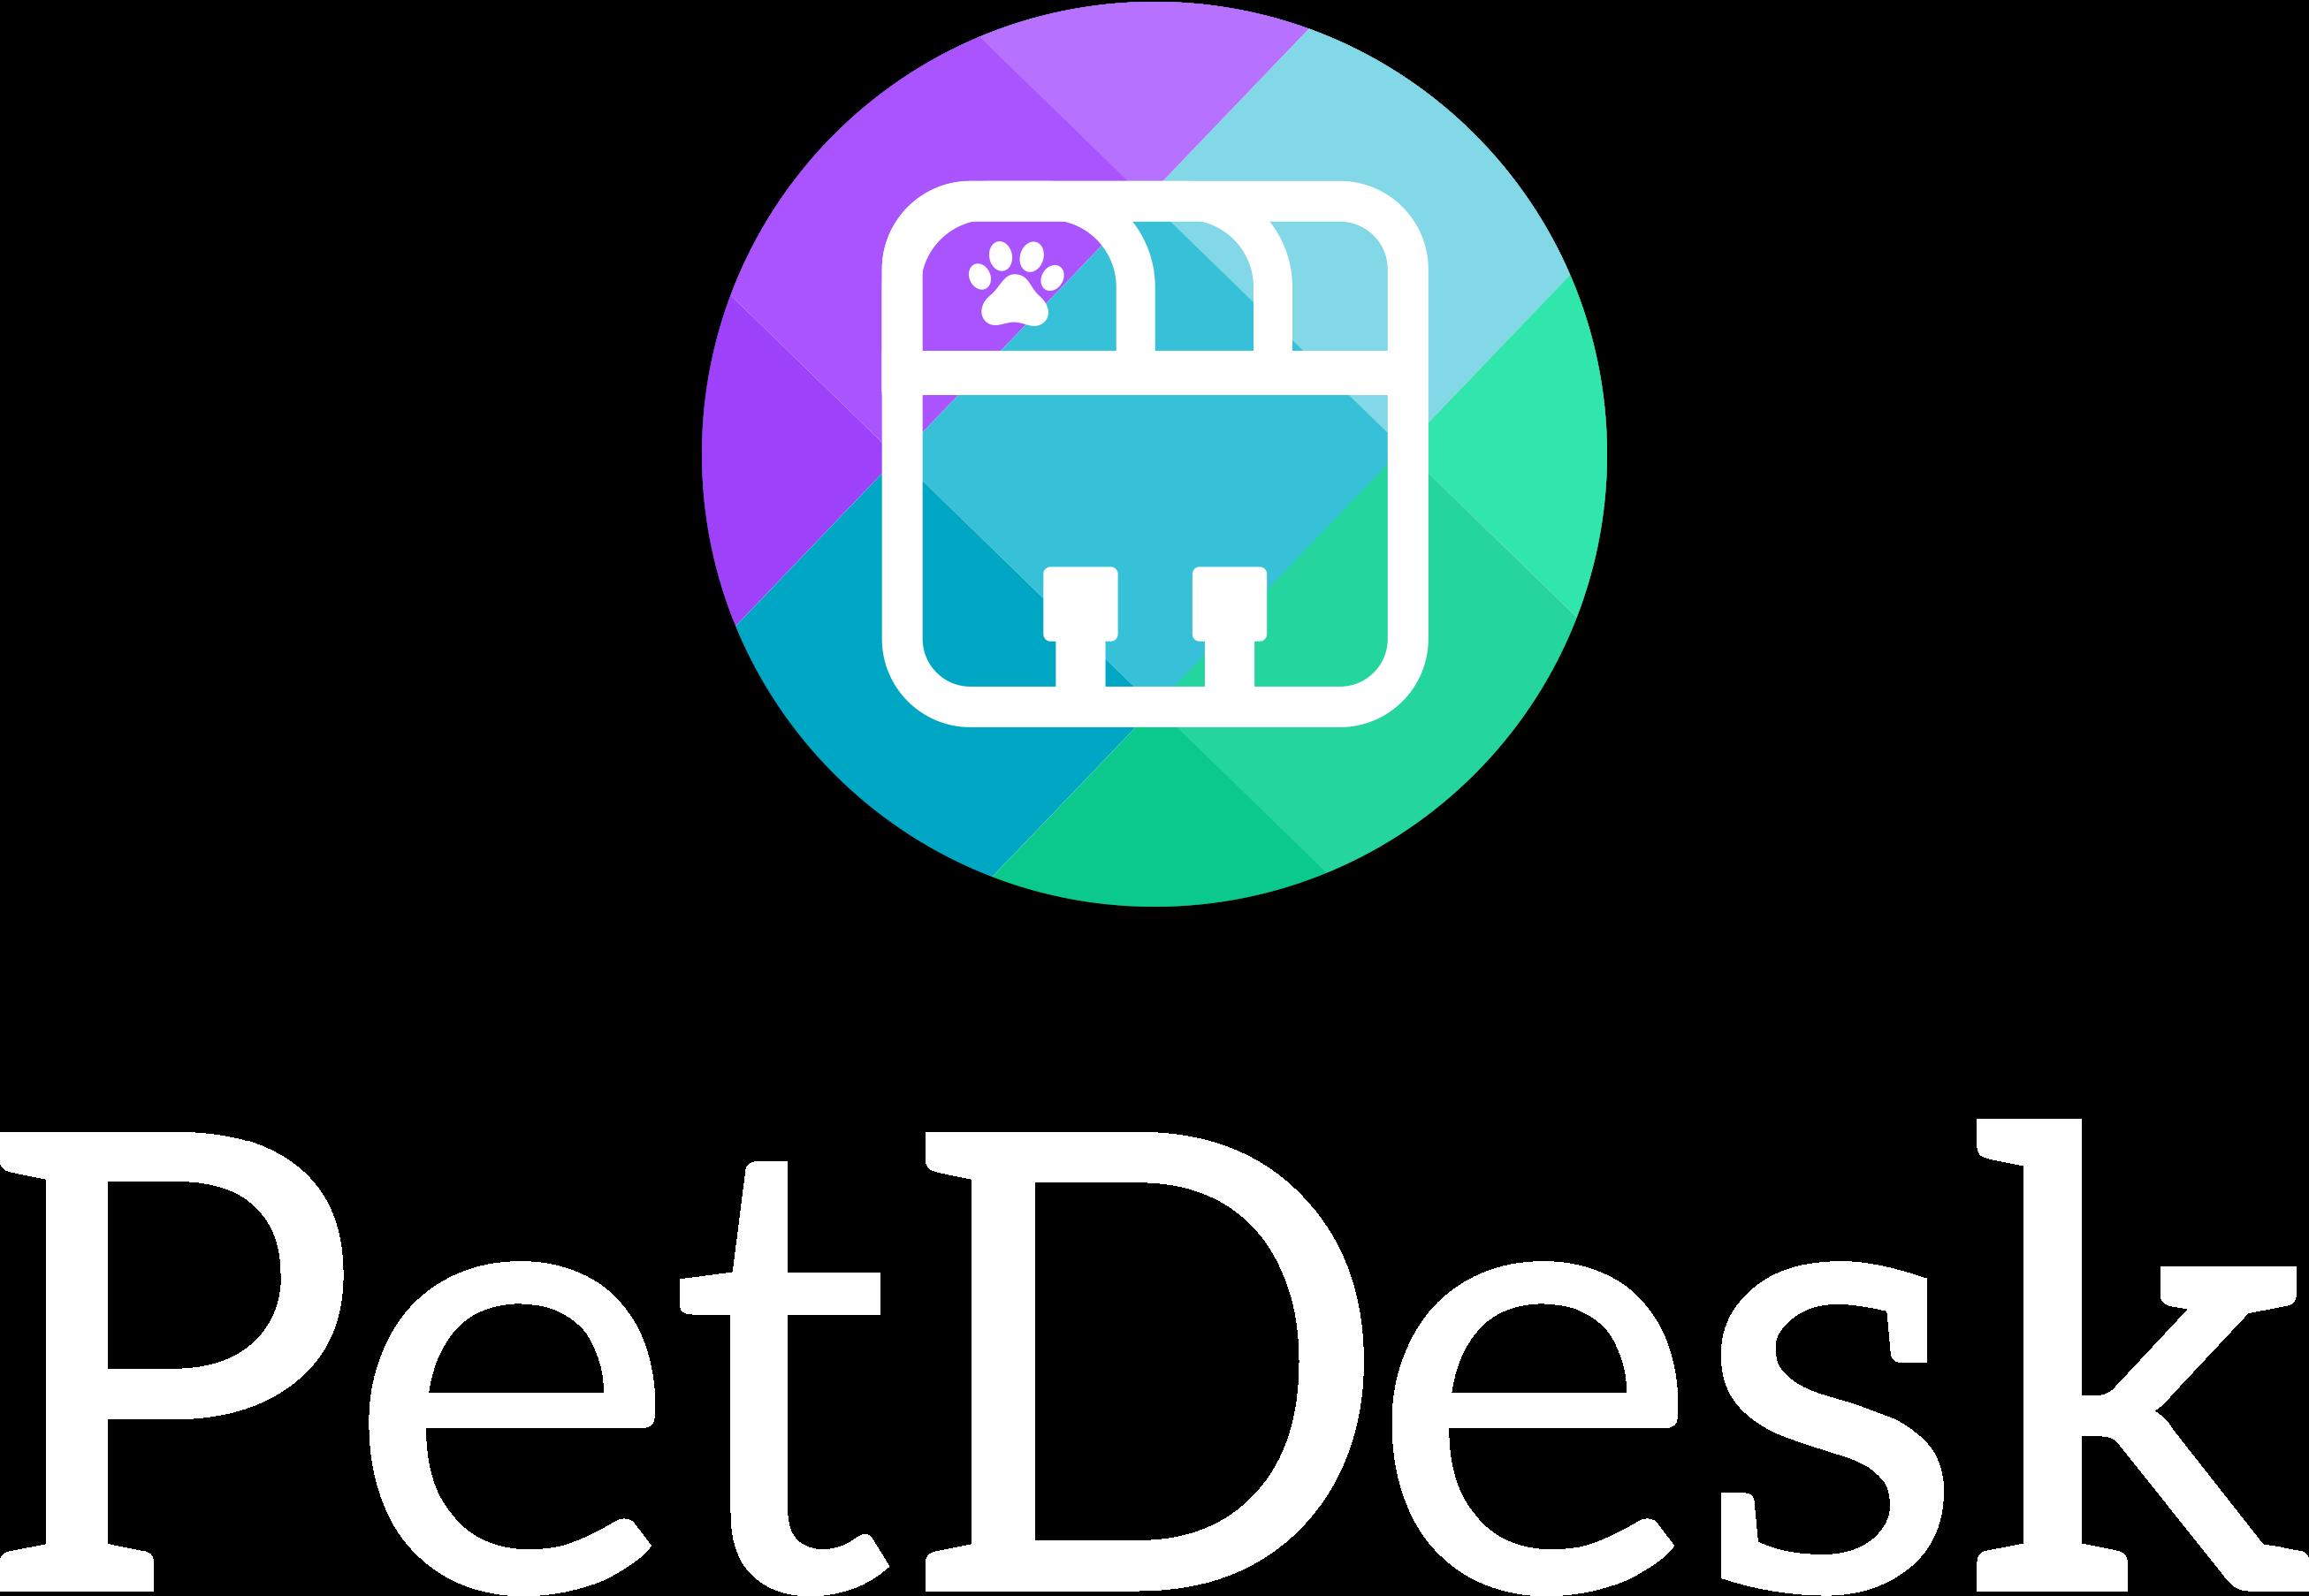 PetDesk-Vertical-Logo-White